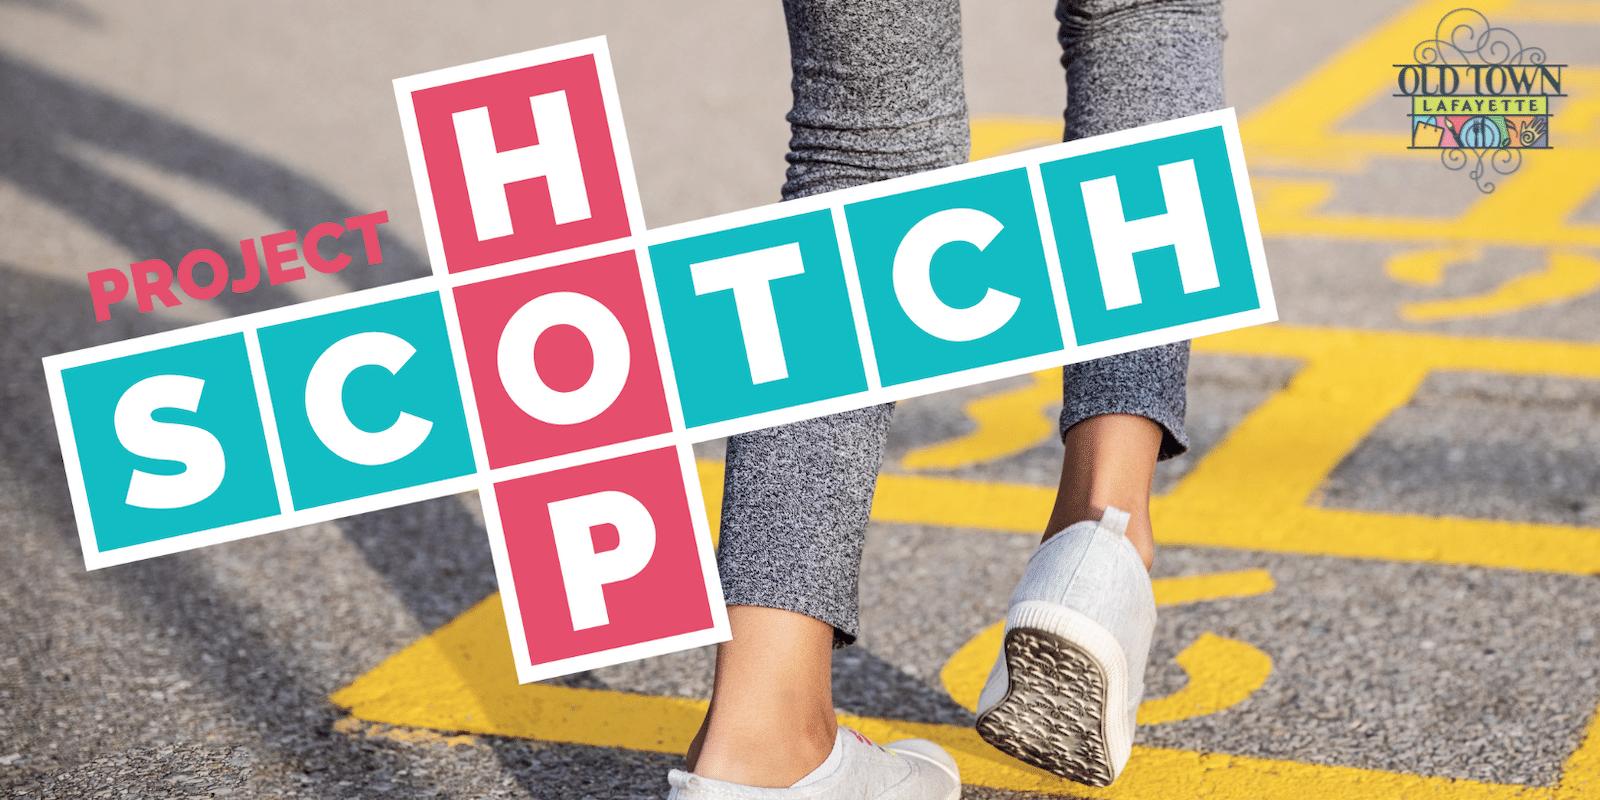 Image of Project Hop Scotch's flyer